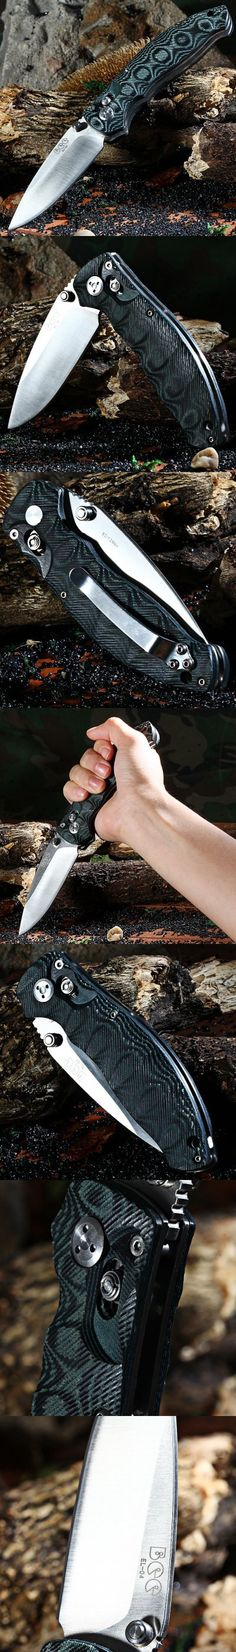 Pocket Knives and Folding Knives   Enlan Bee EL-04 MCT Axis Lock Folding Knife